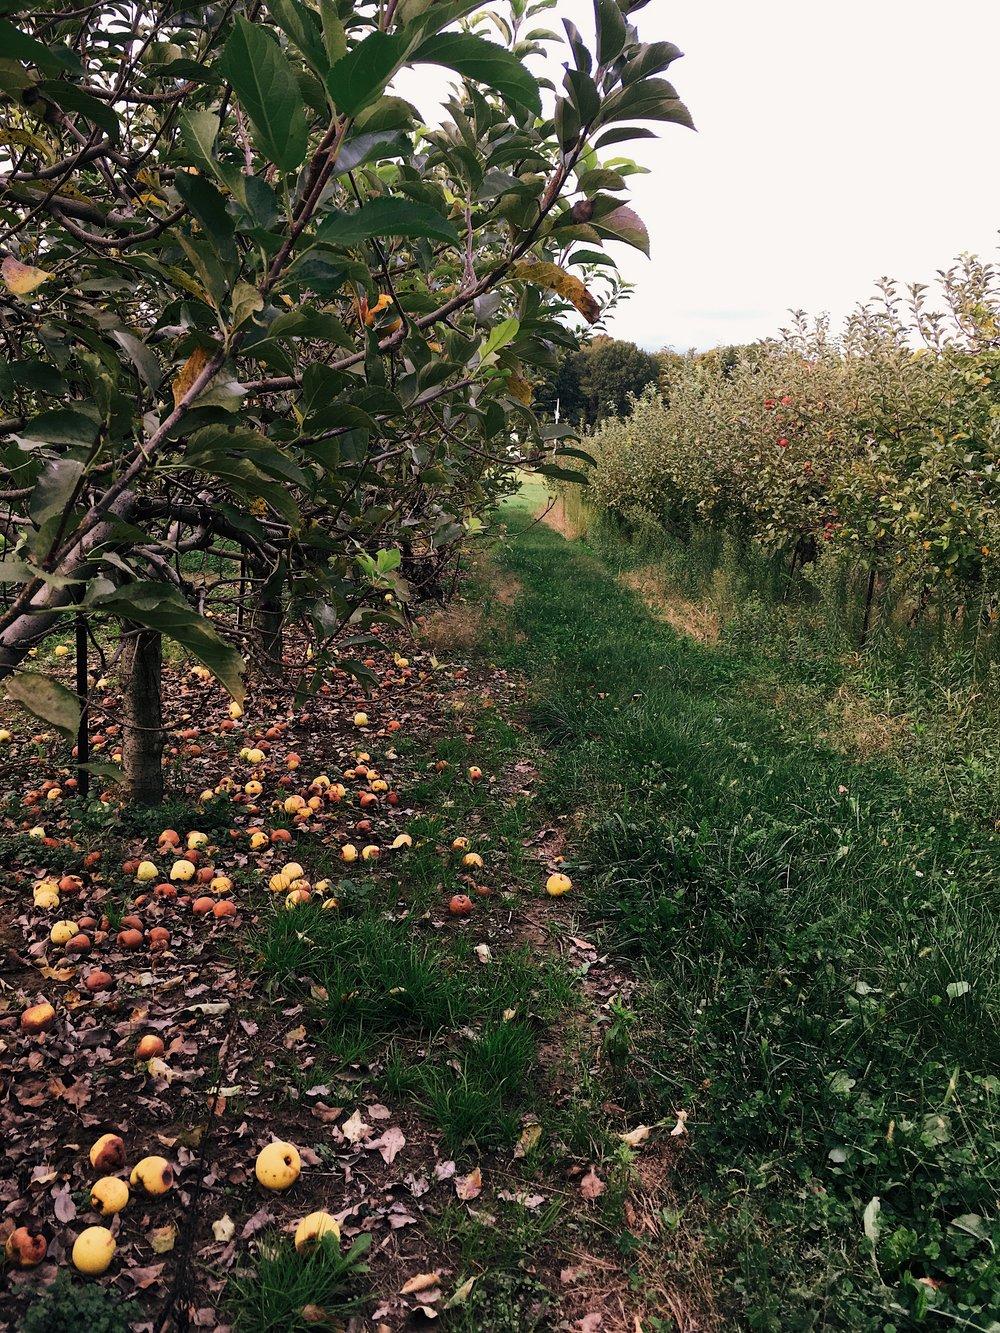 Apple Orchard Ohio Organic Image by Samantha Spigos